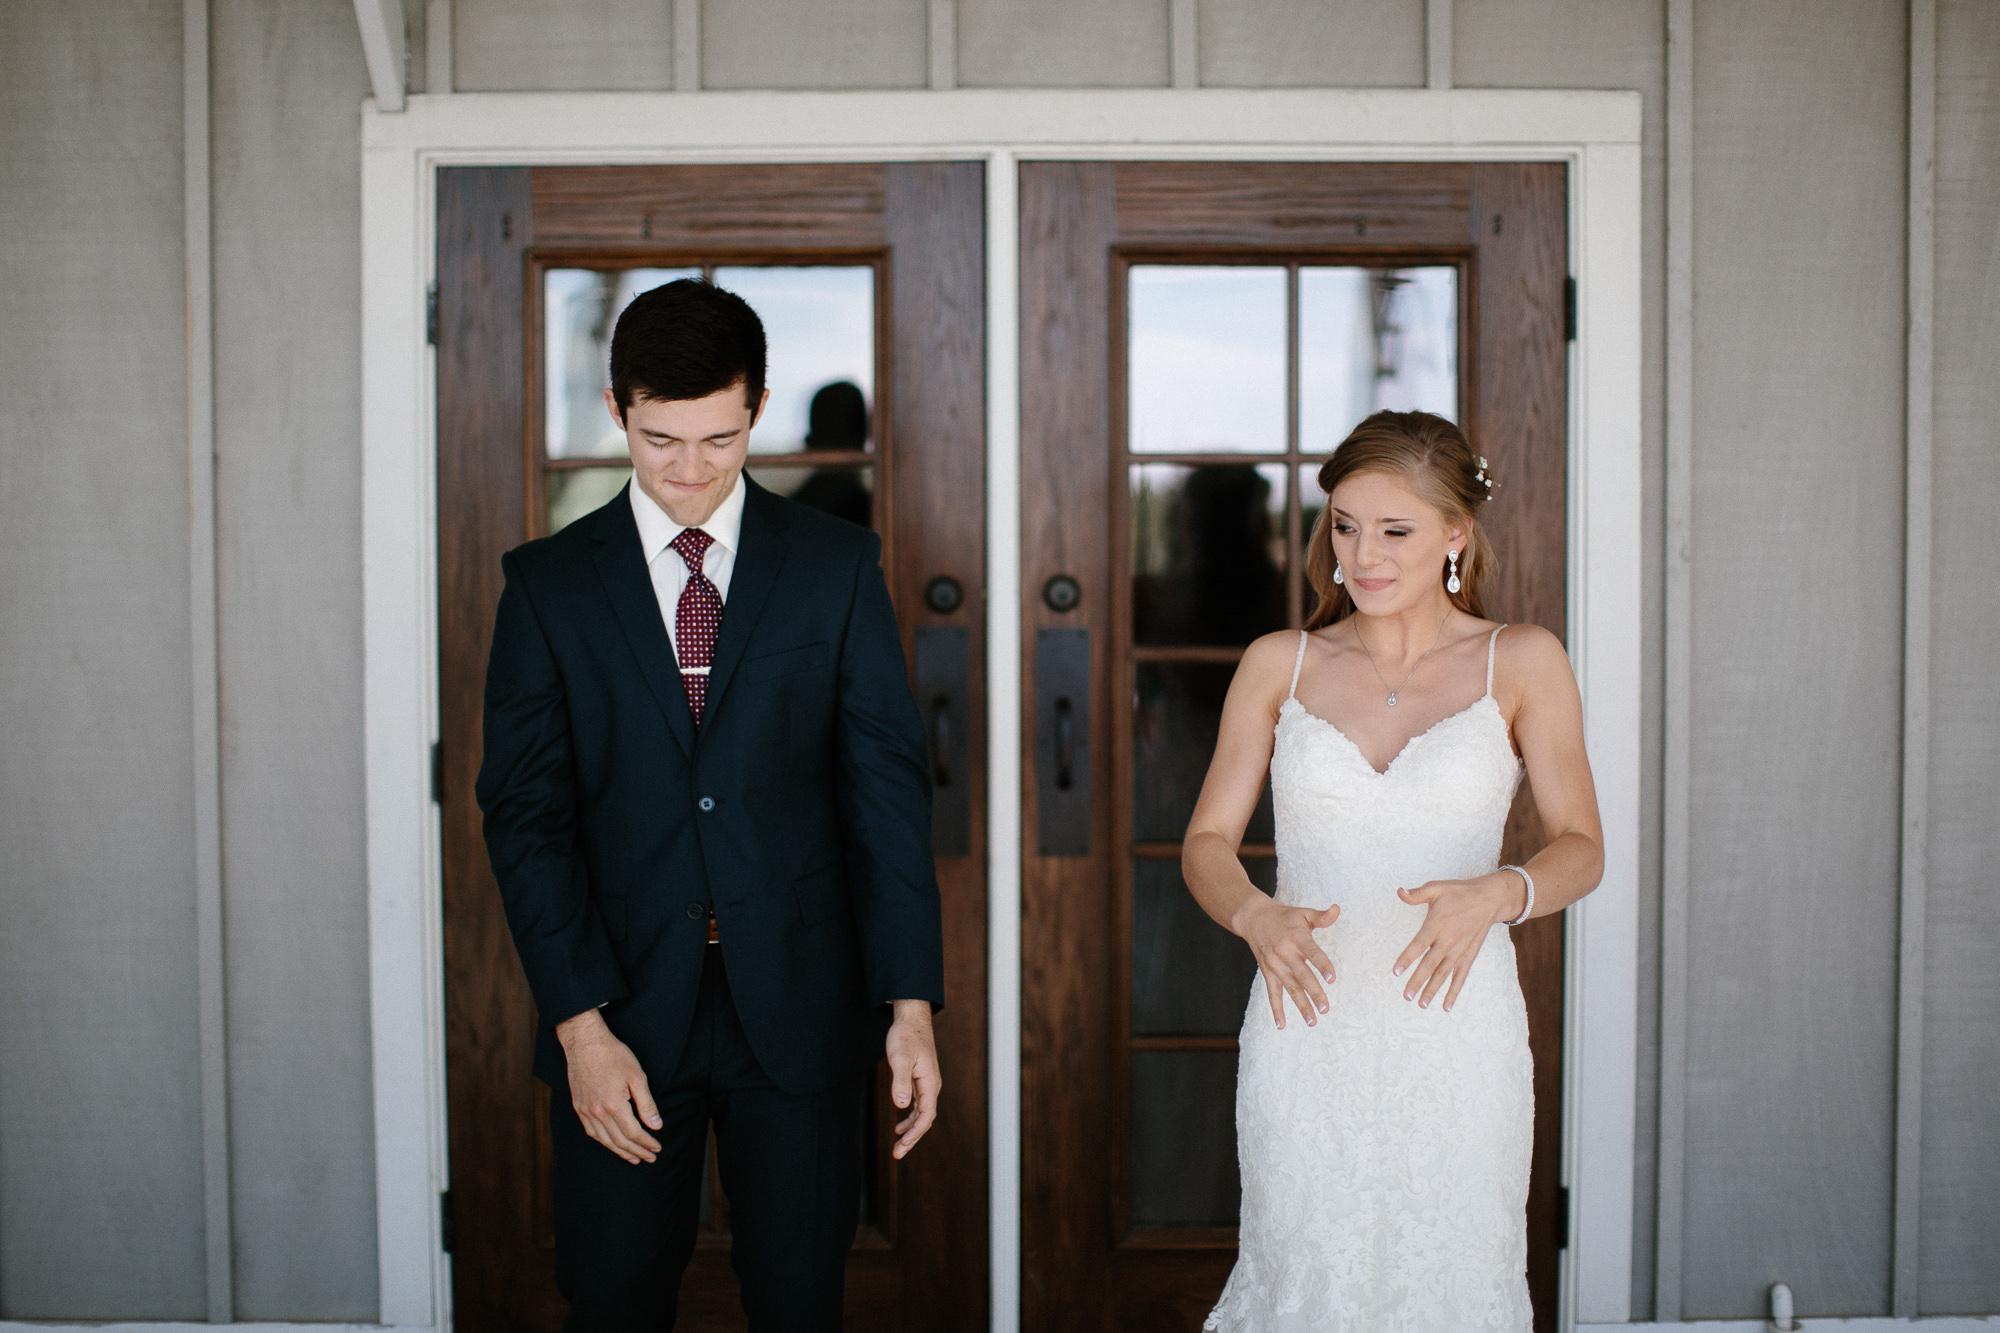 wedding-elopement-adventerous-romantic-timeless-south-dakota-blue-haven-barn-019.jpg